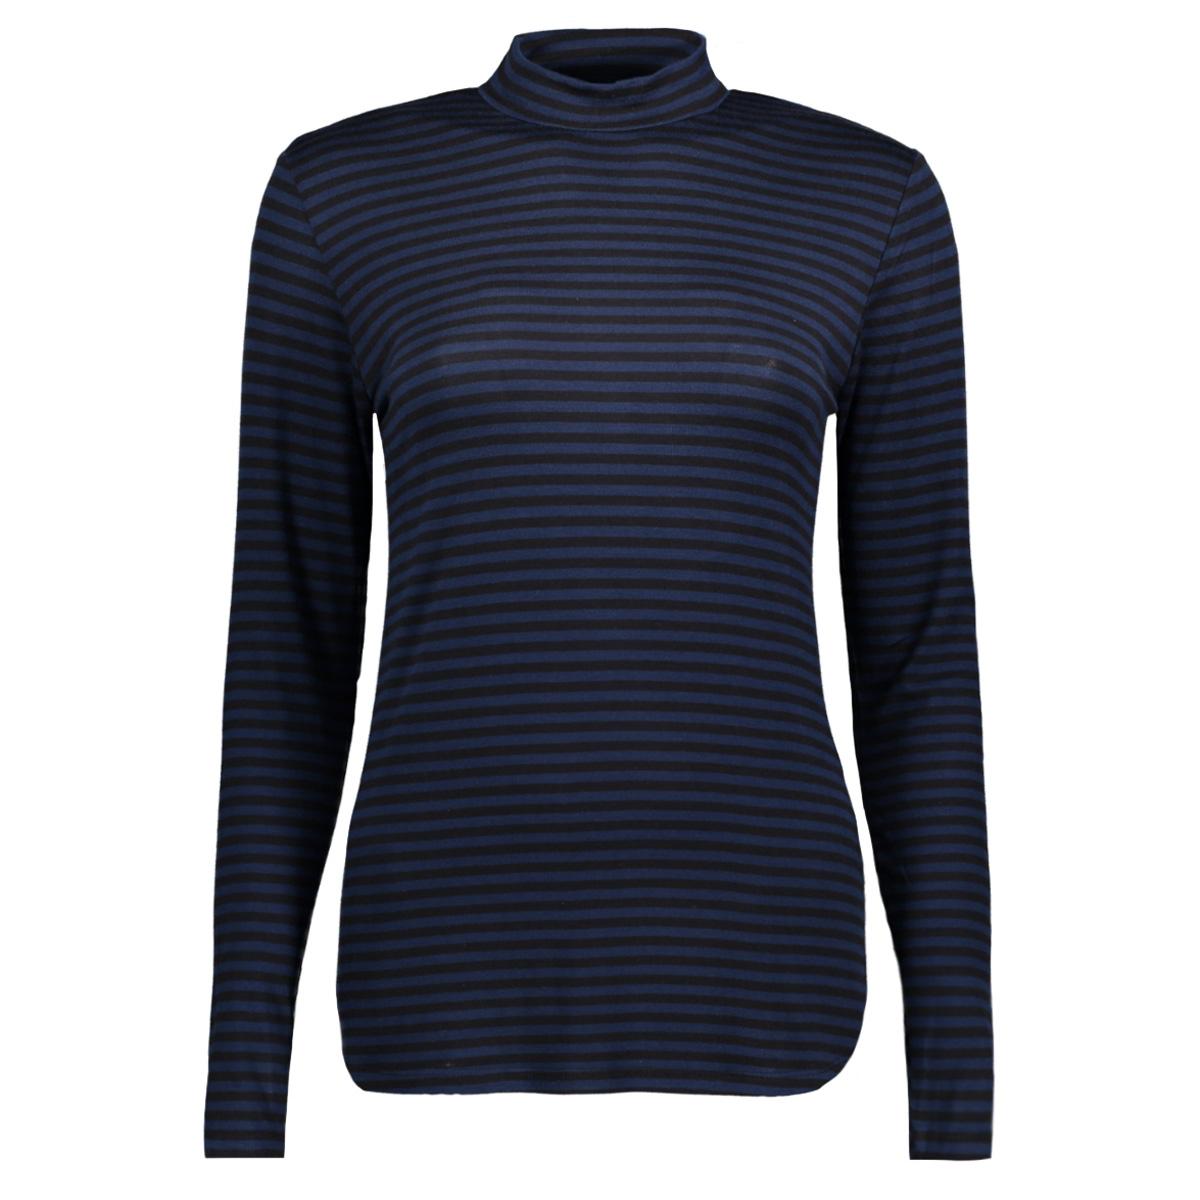 jdyspirit ls highneck stripe top jr 15141522 jacqueline de yong t-shirt dress blues/black